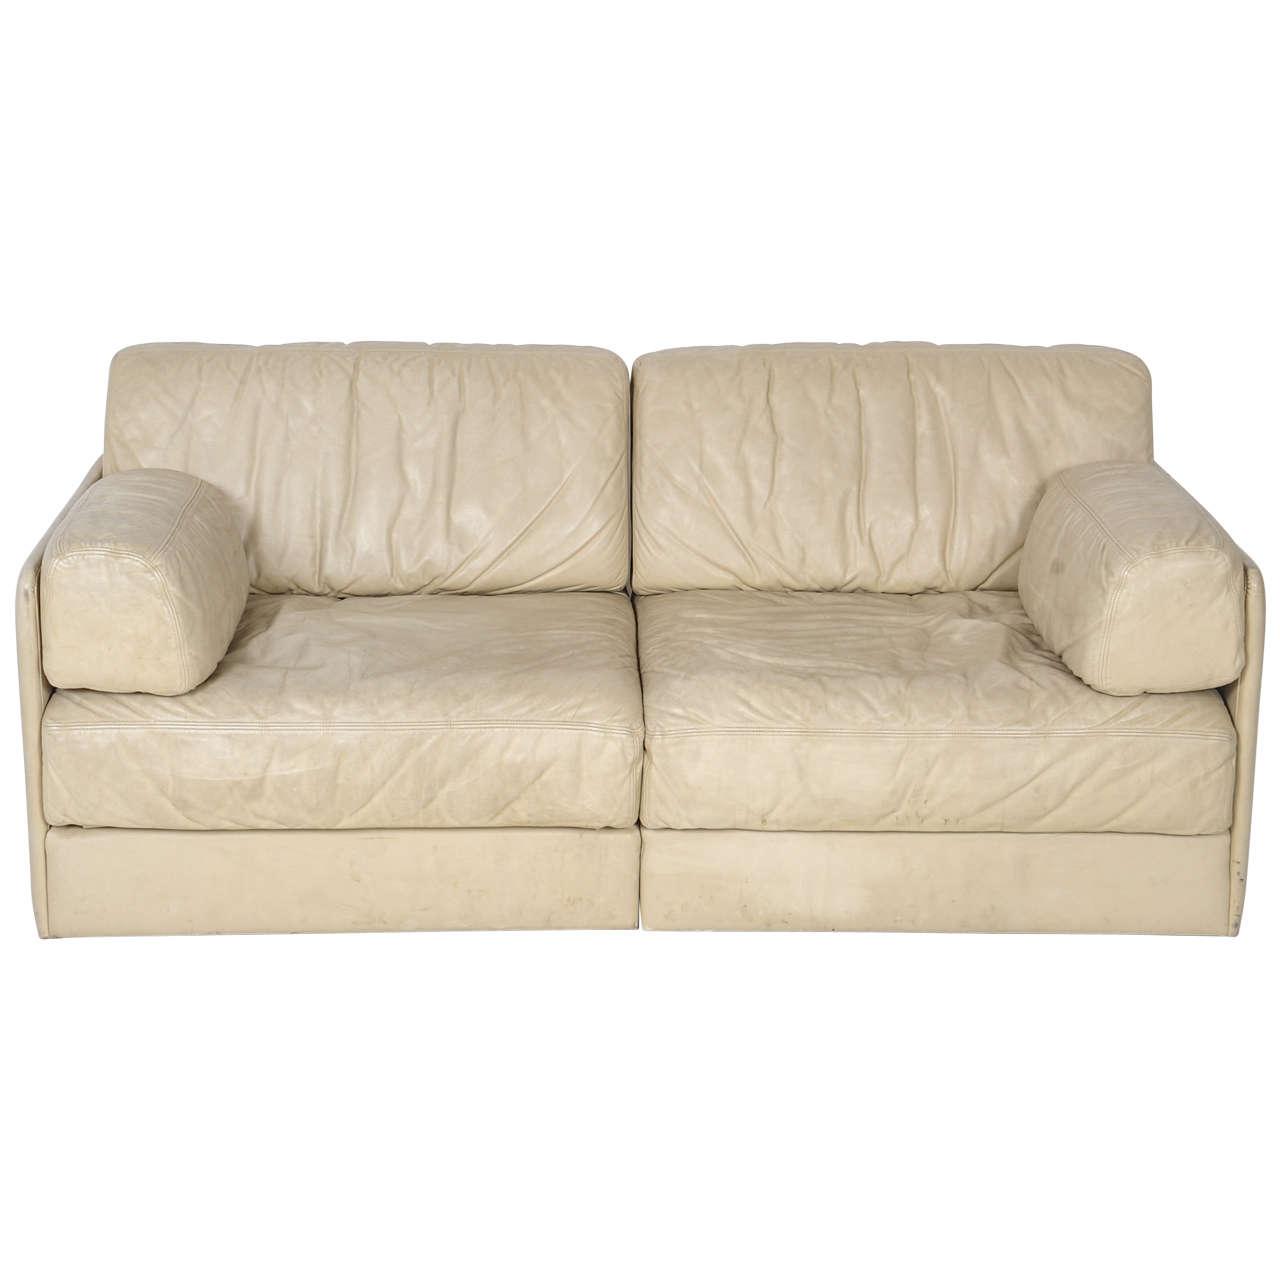 76 sofa baldwin 89 slipcovered sofa 3 in eggs pinstripe for 76 sectional sofa